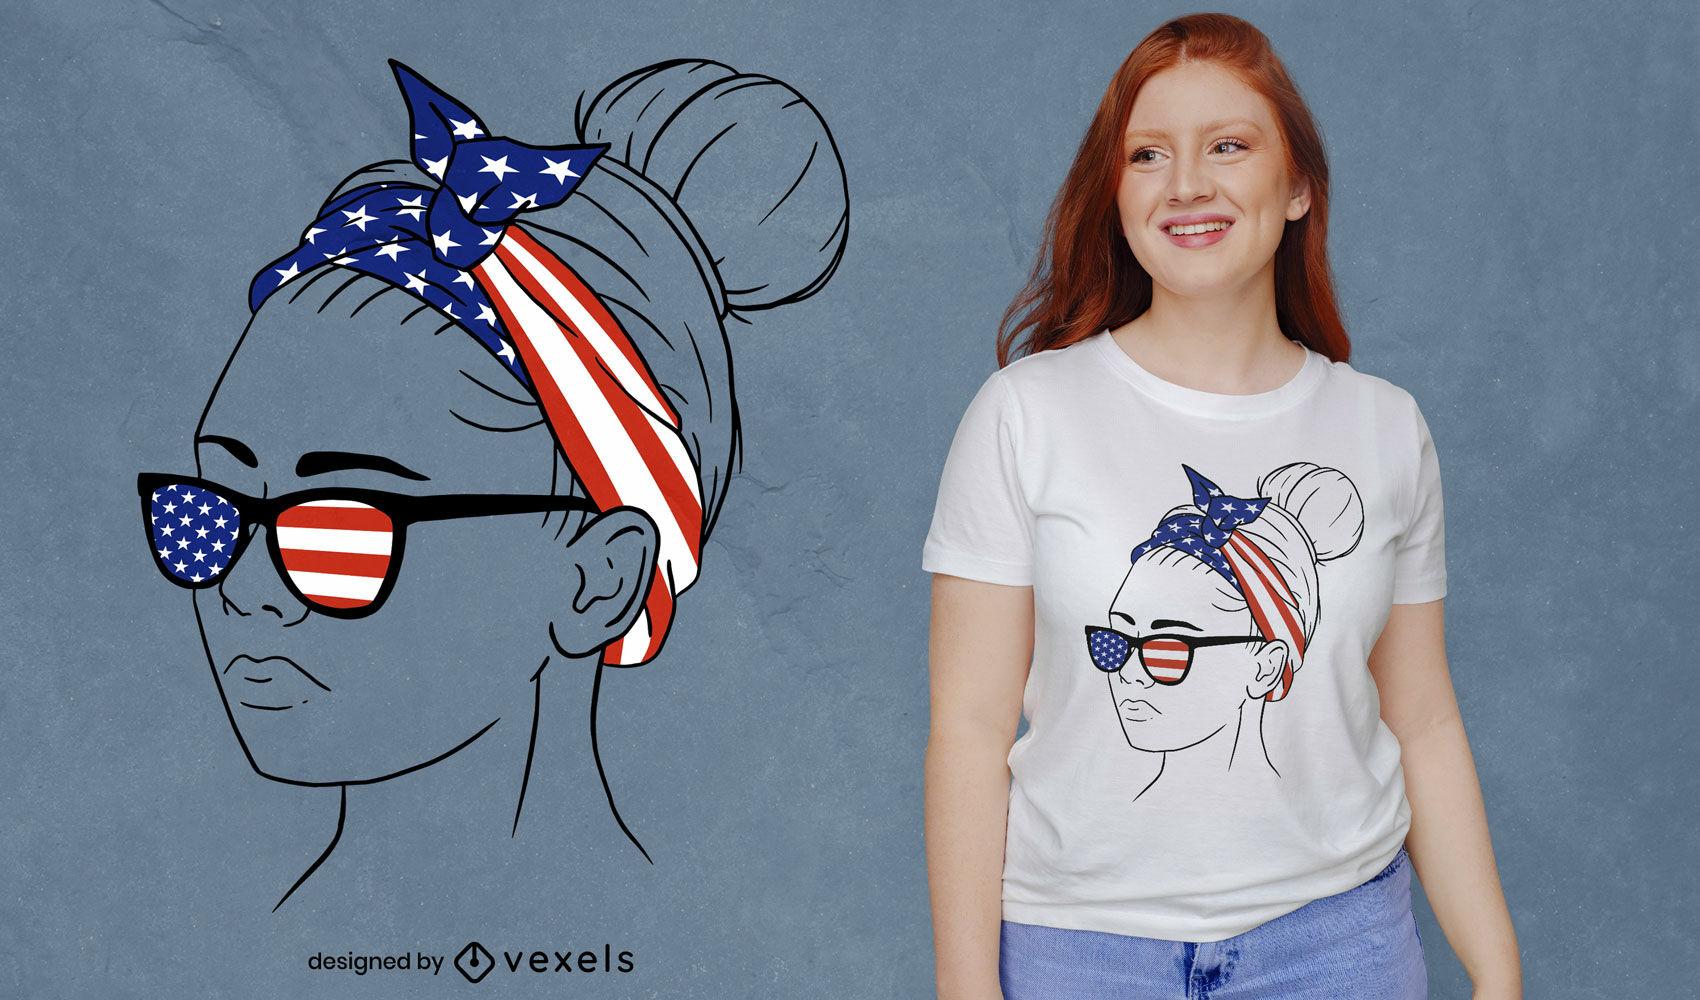 American flag bandana girl t-shirt design